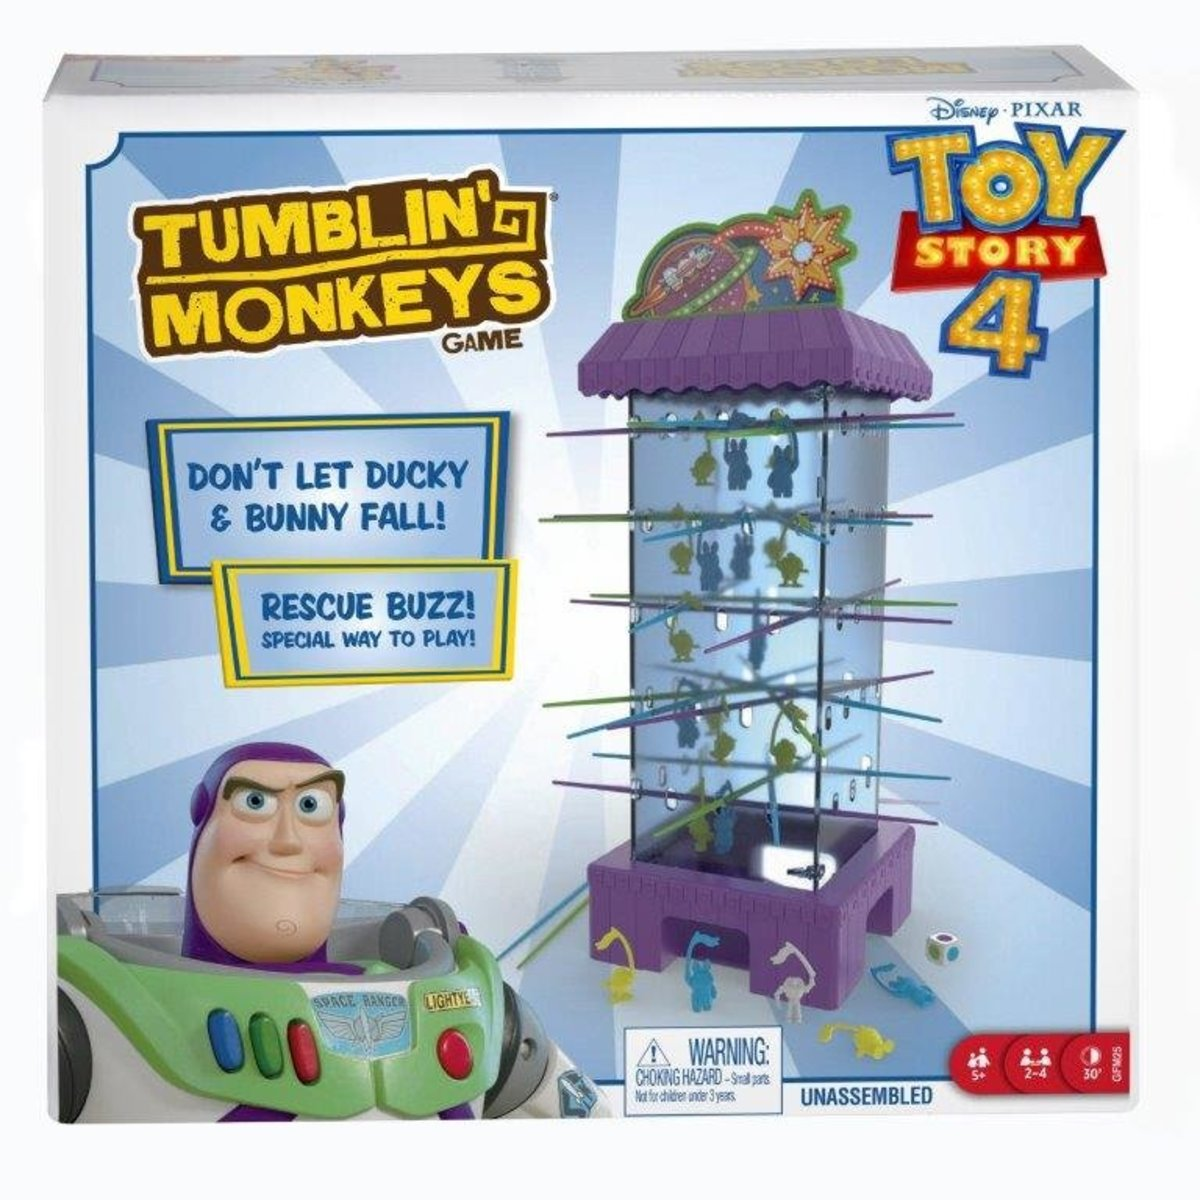 Toy Story 4 Tumblin' Monkeys Game